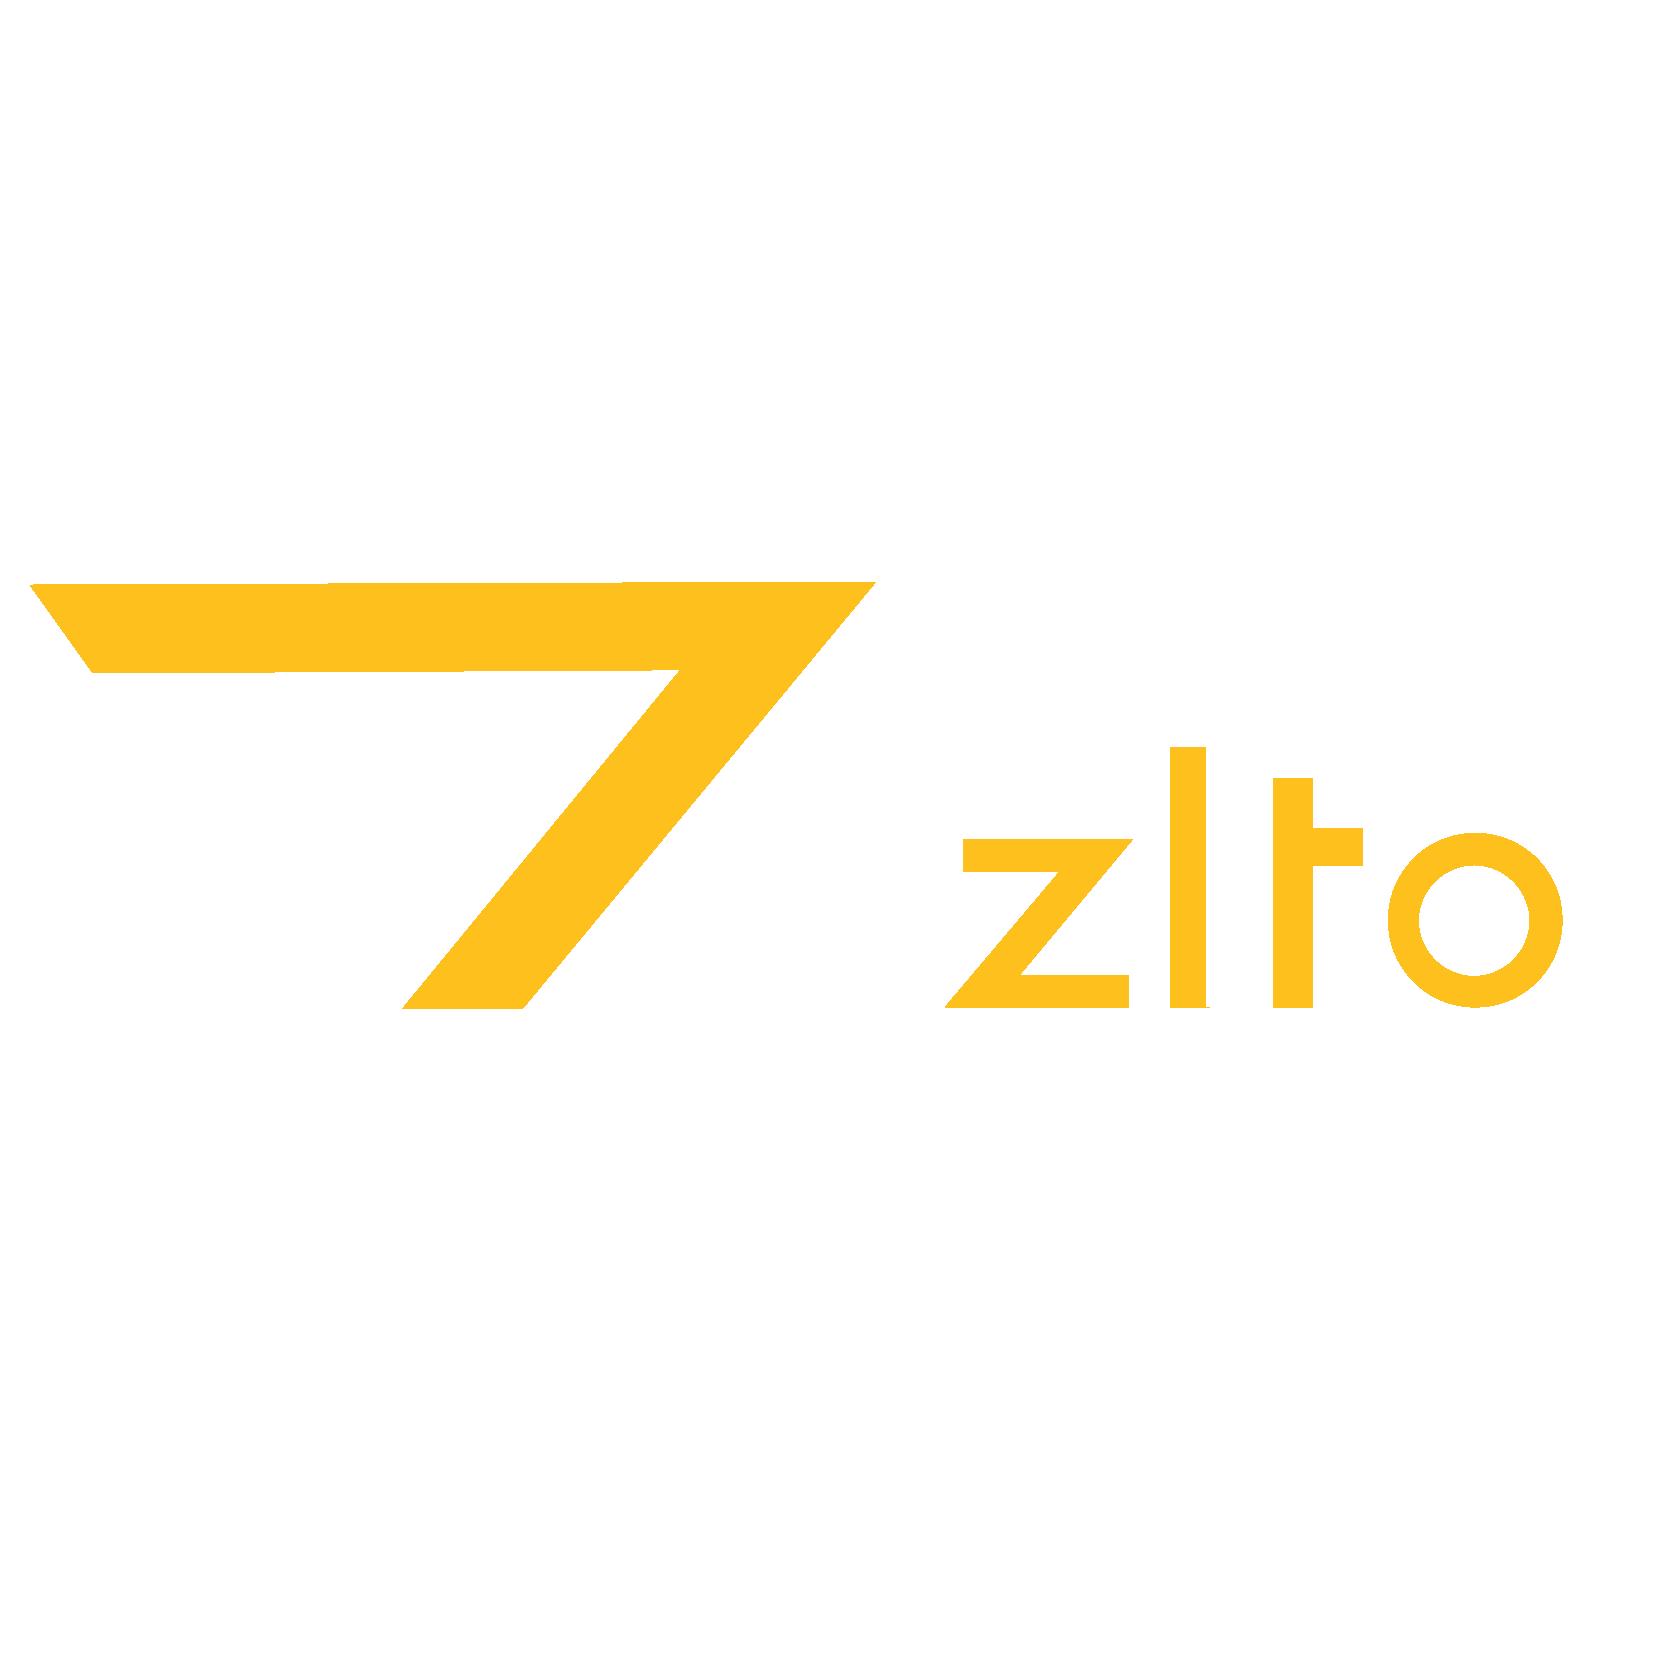 zlto_v2_white_logo.png